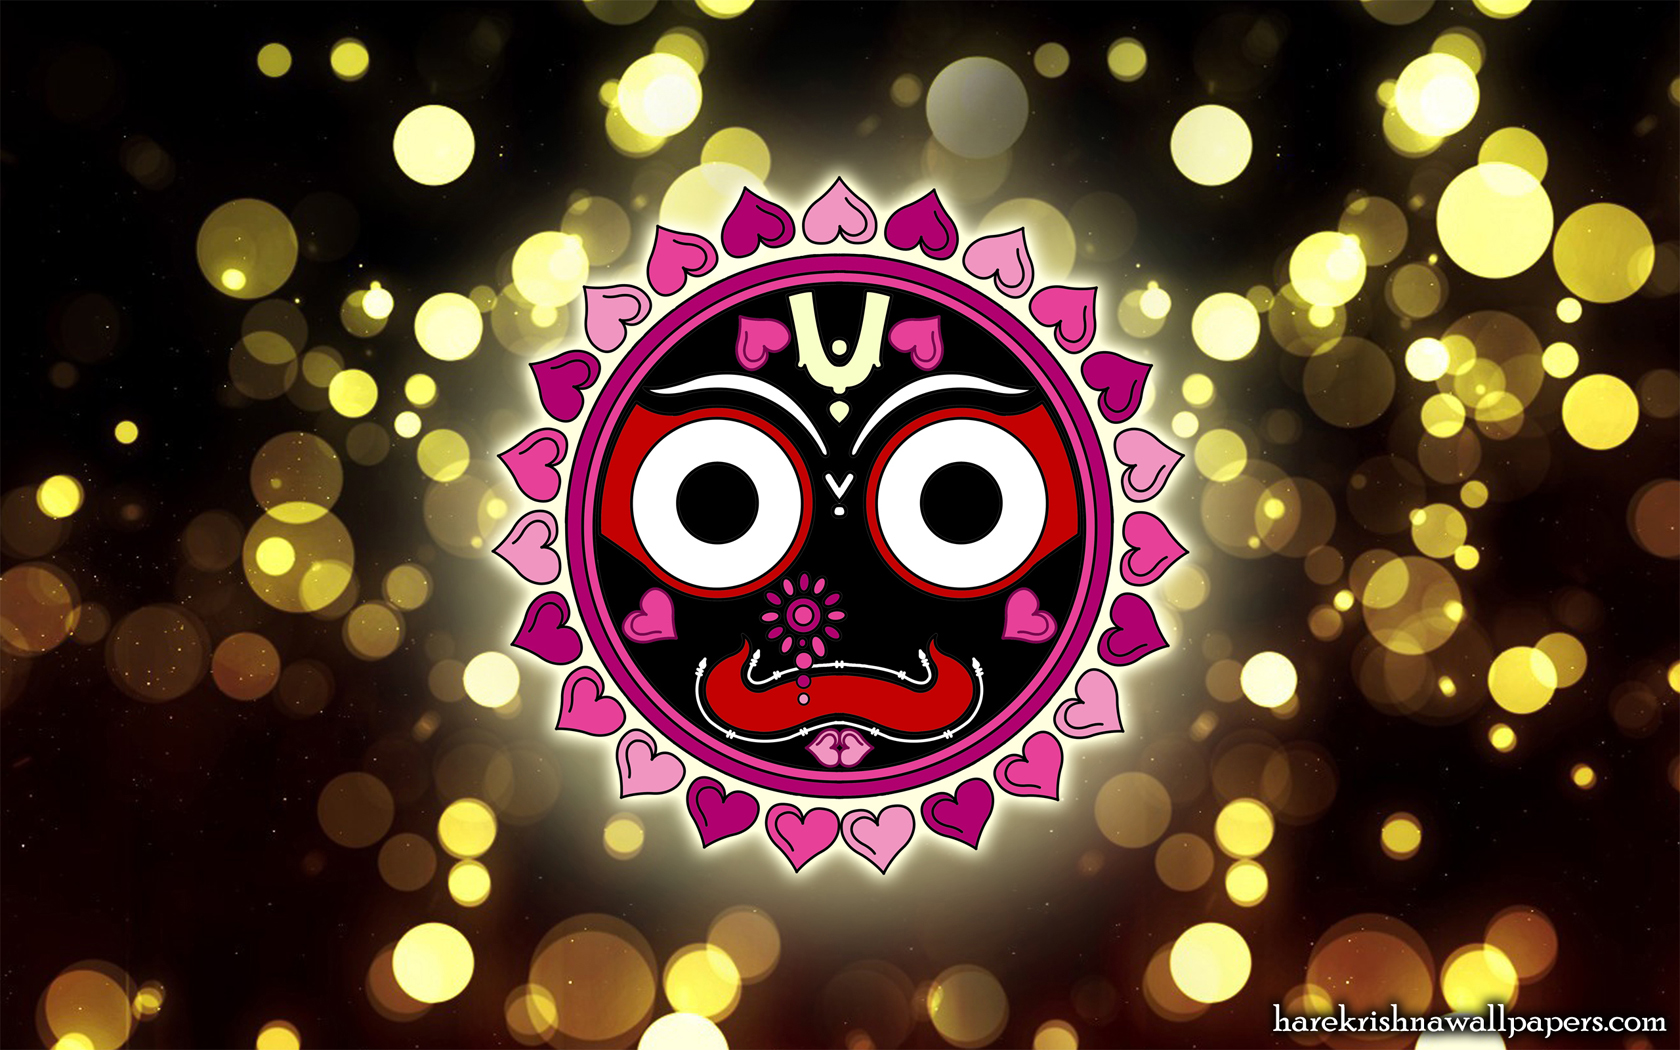 Jai Jagannath Wallpaper (049) Size 1680x1050 Download